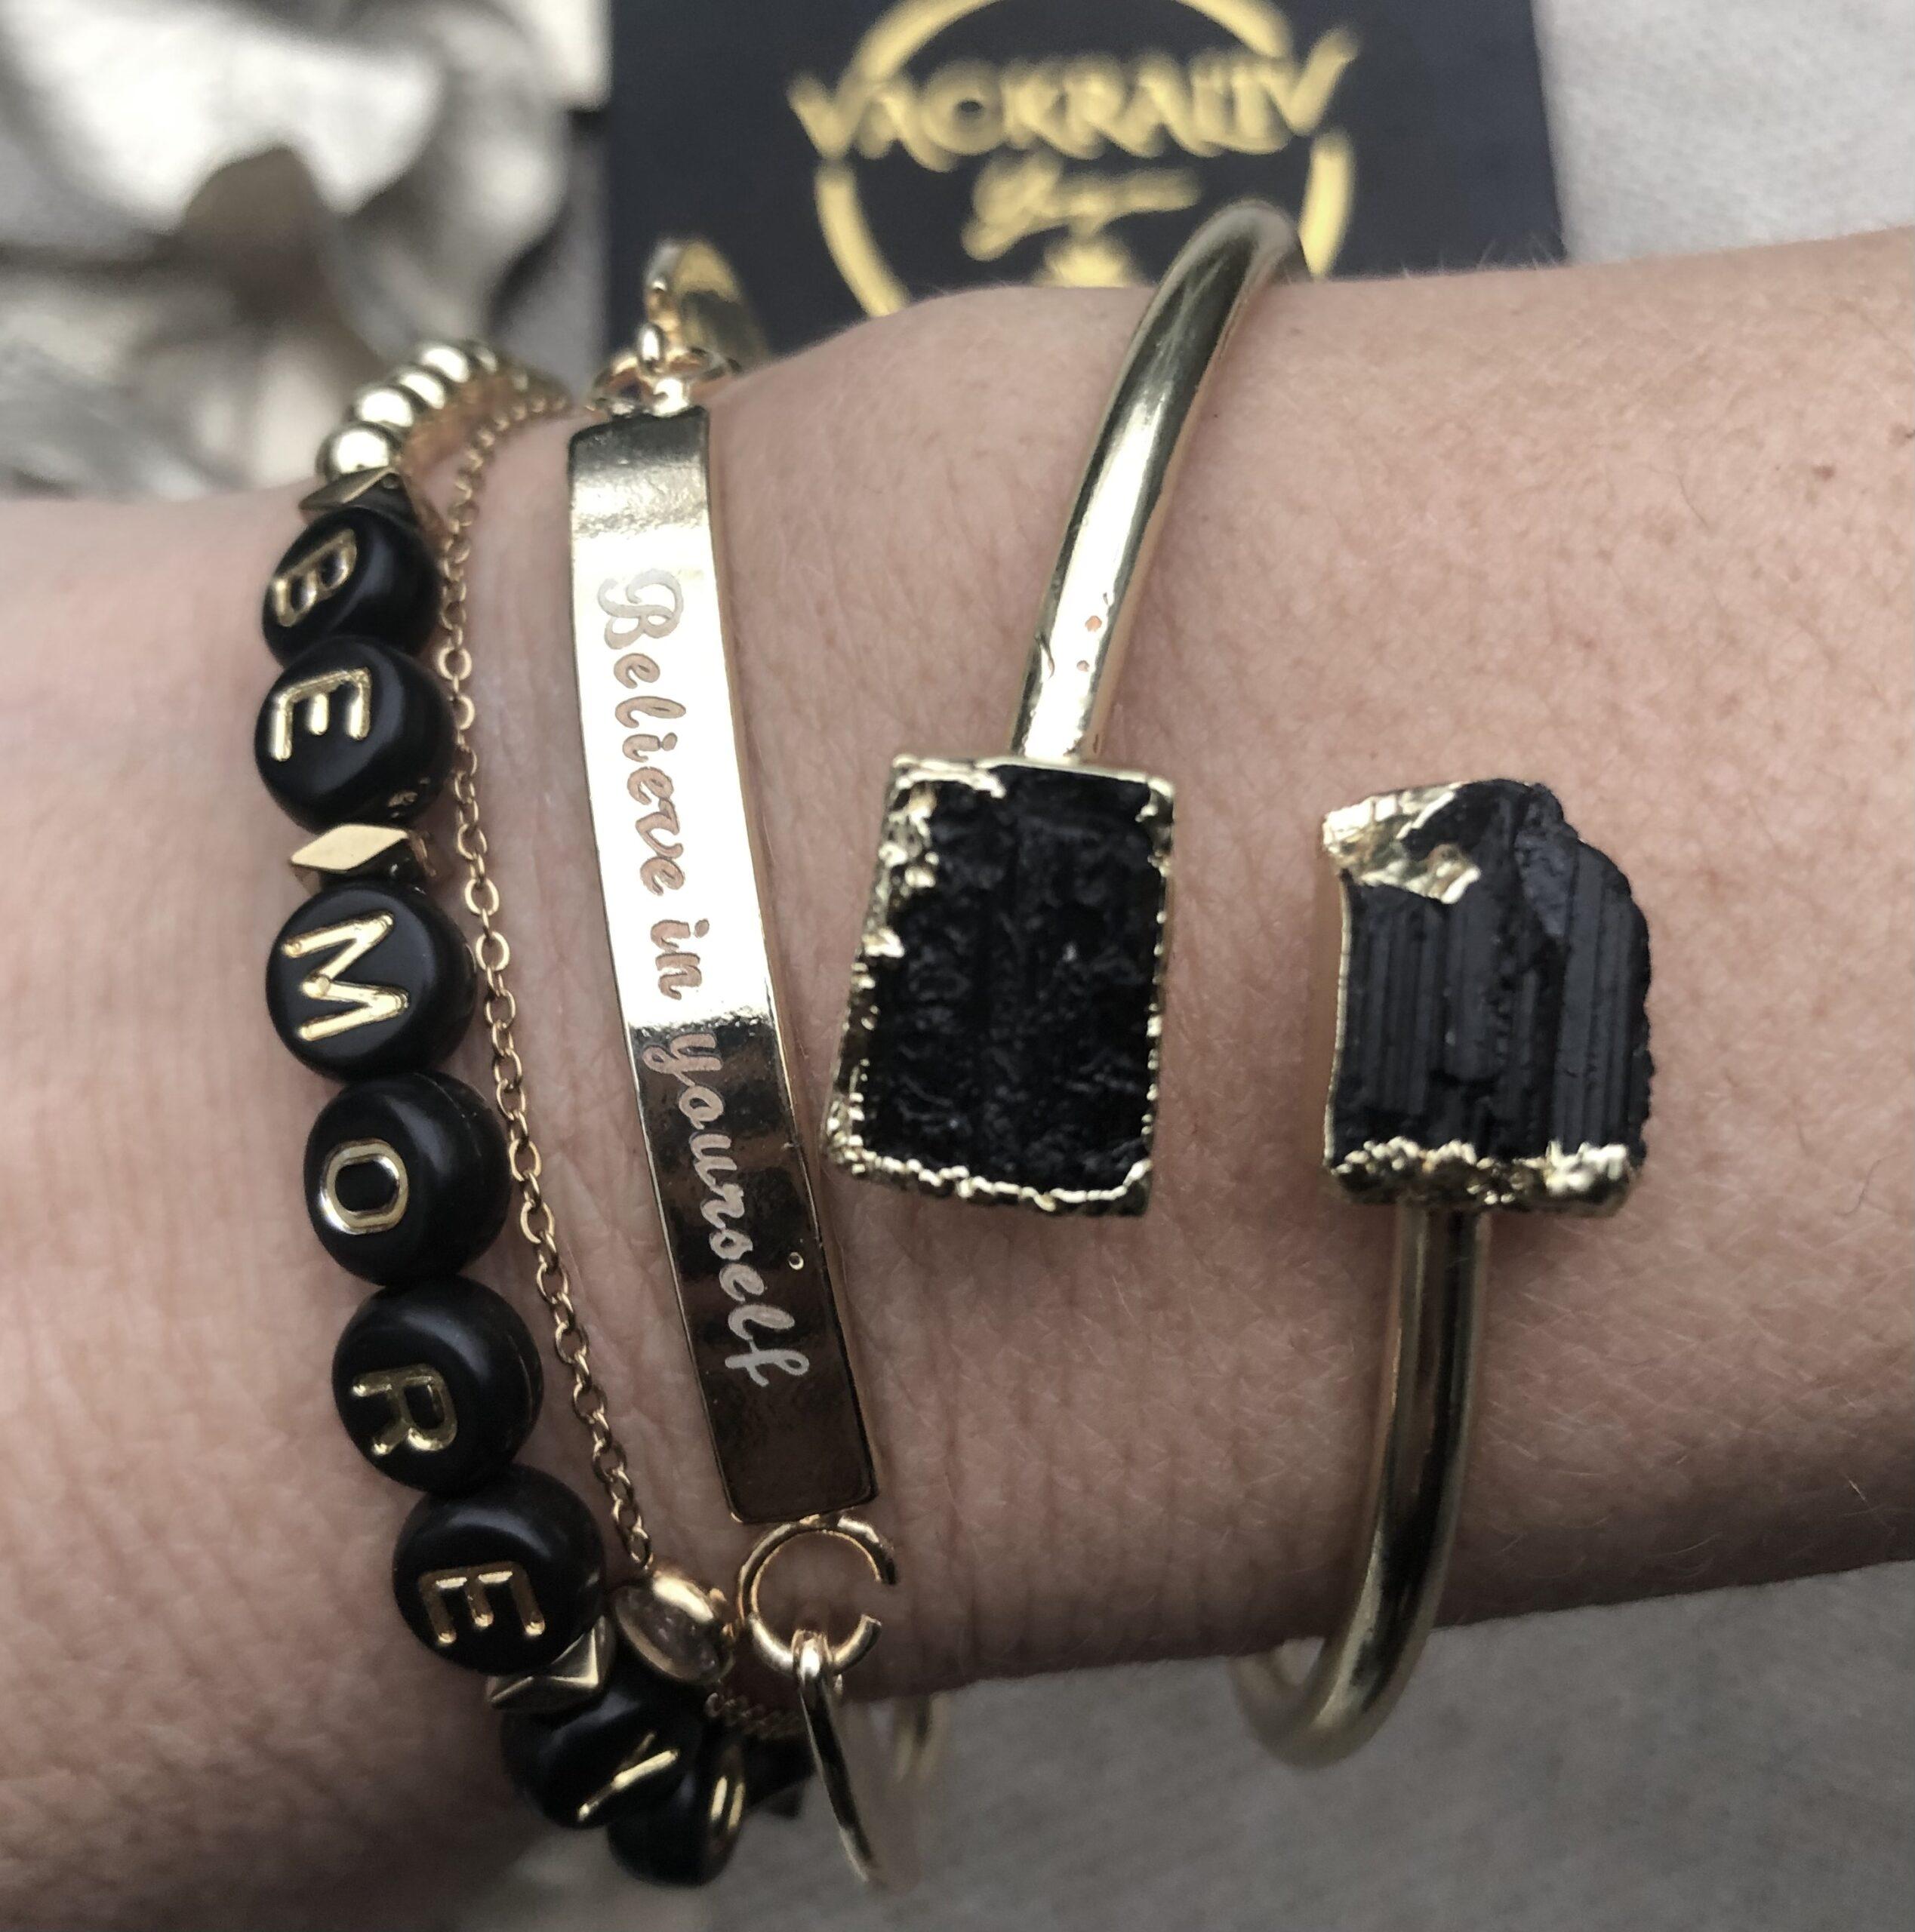 Black Tourmaline 24k gold plated bangle